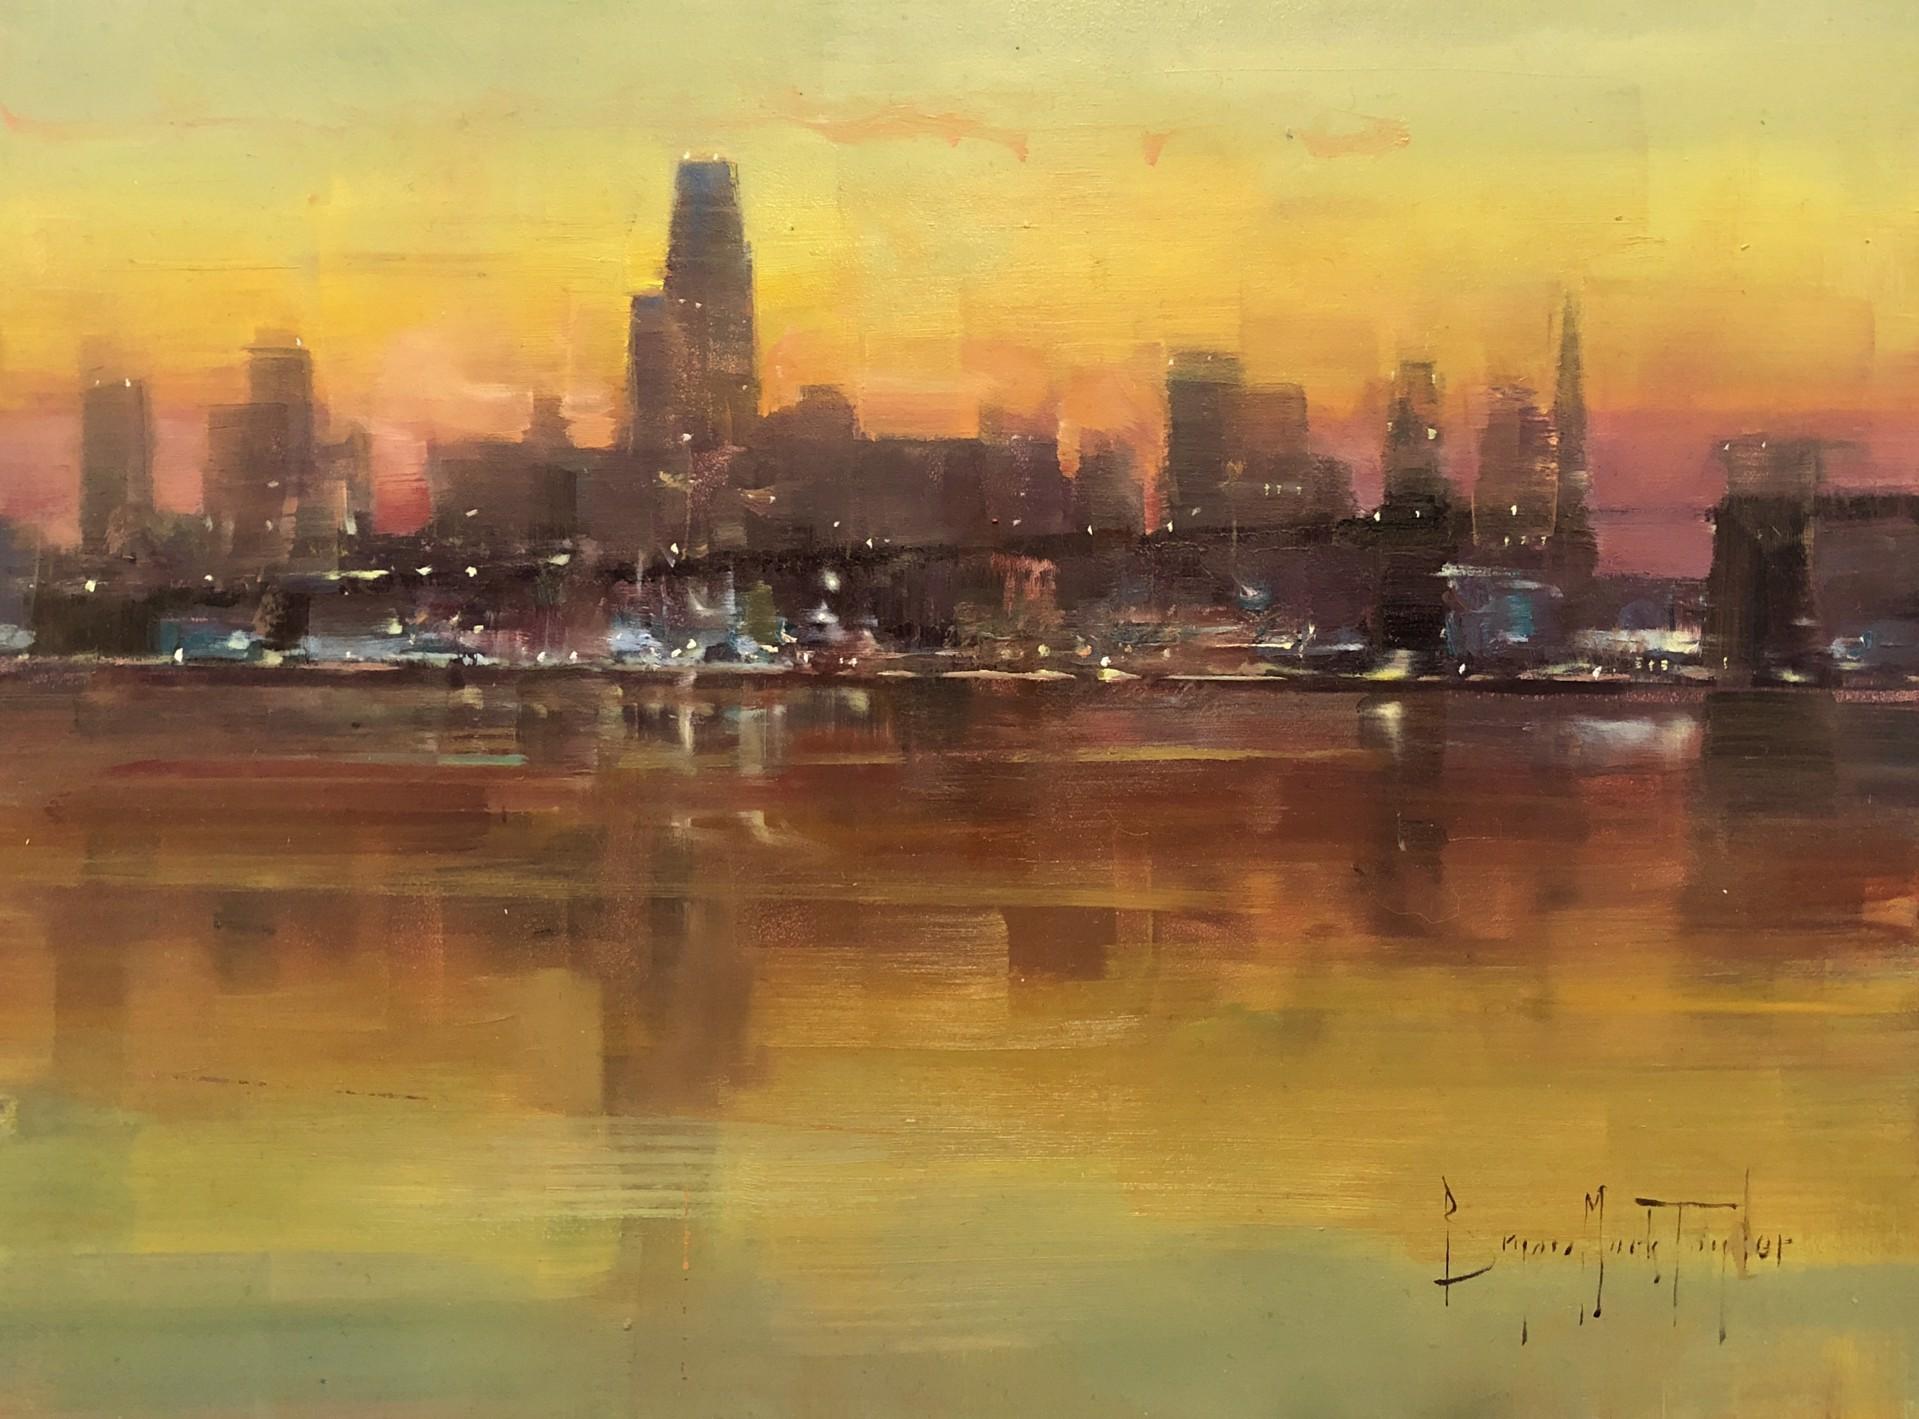 San Francisco Skyline by Bryan Mark Taylor